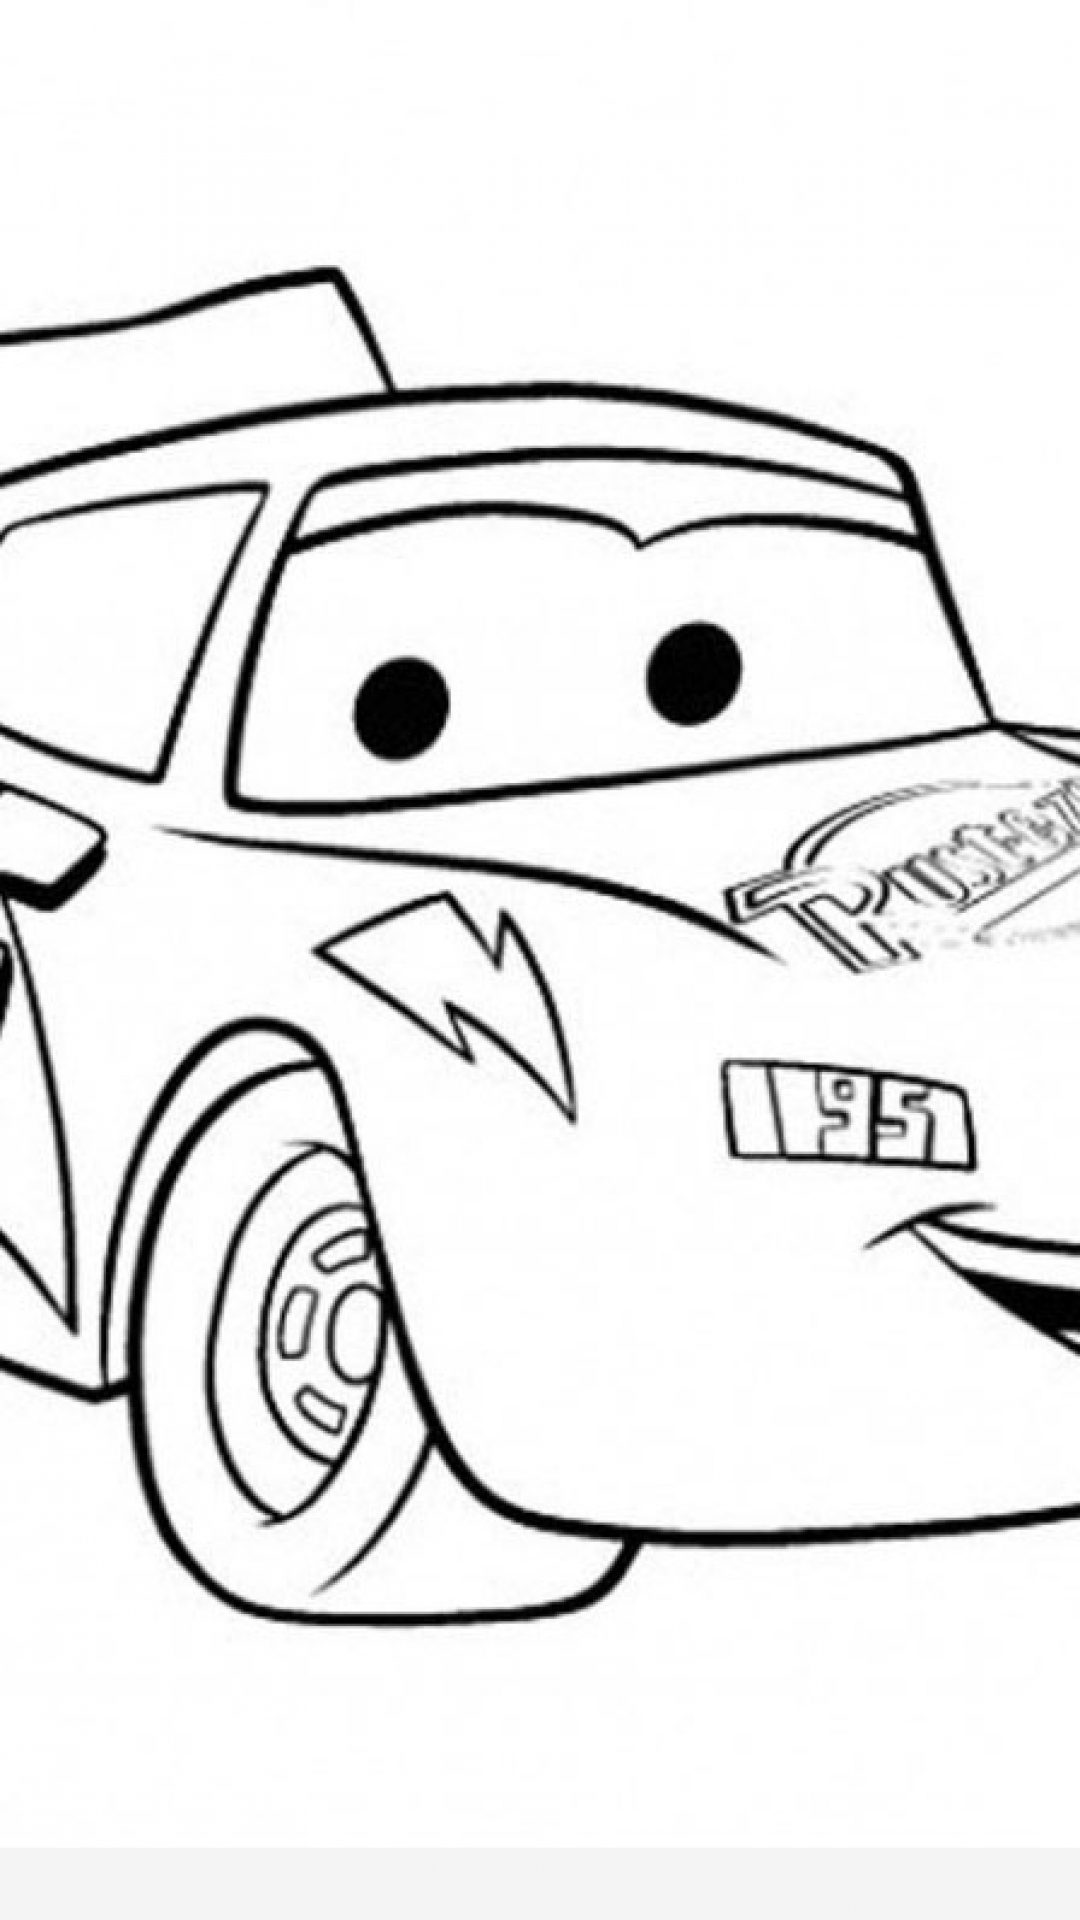 Draw book robertson scott pdf to how